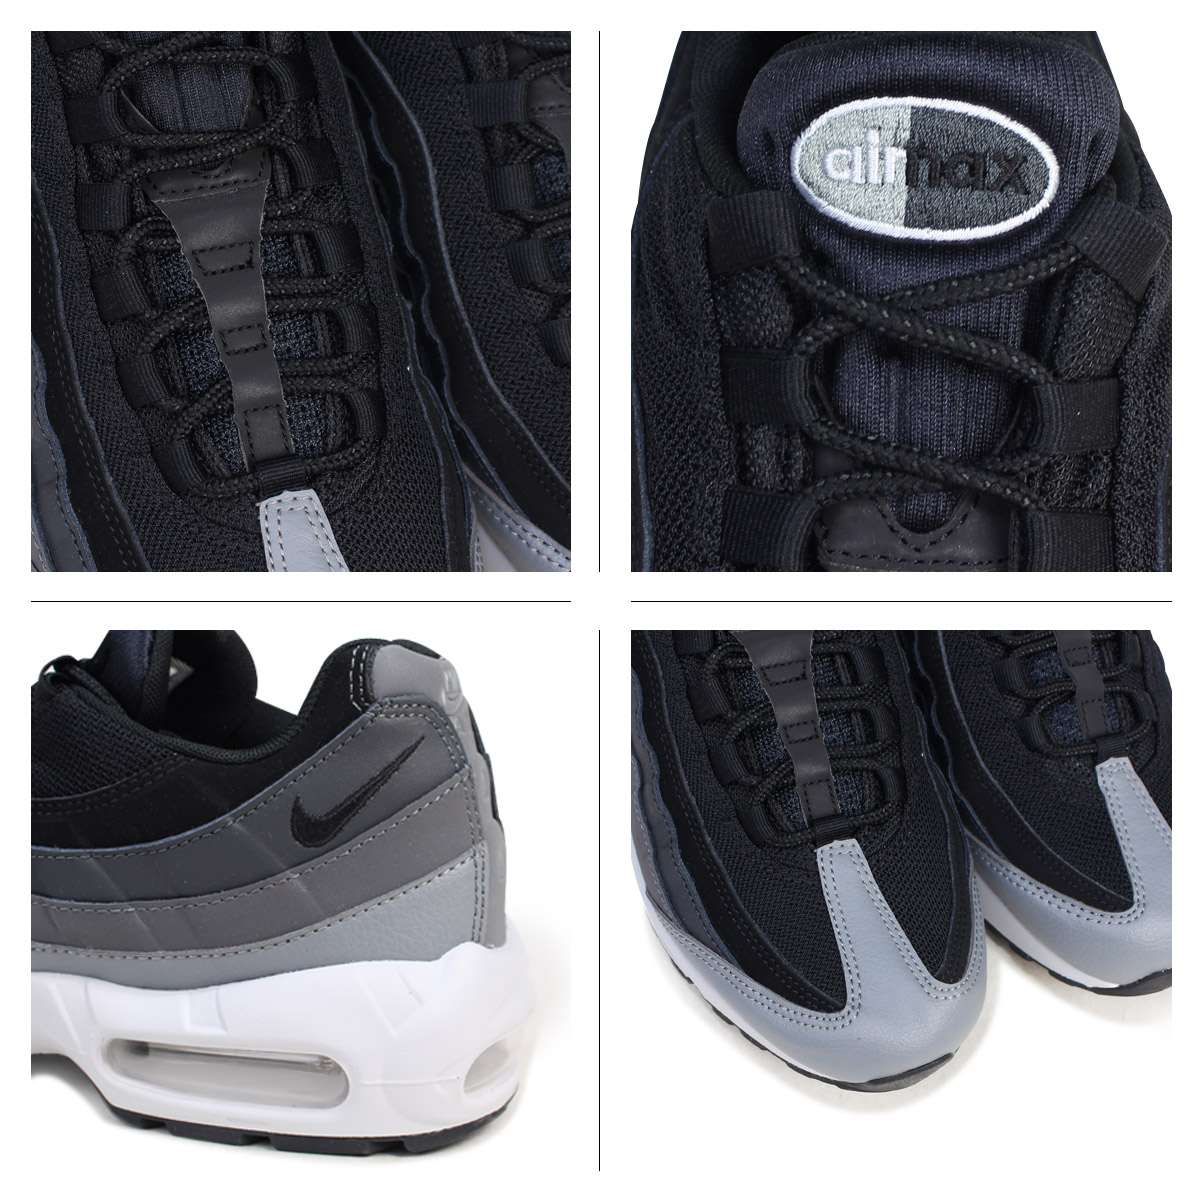 ALLSPORTS  NIKE Kie Ney AMAX 95 essential sneakers AIR MAX 95 ... 425830811